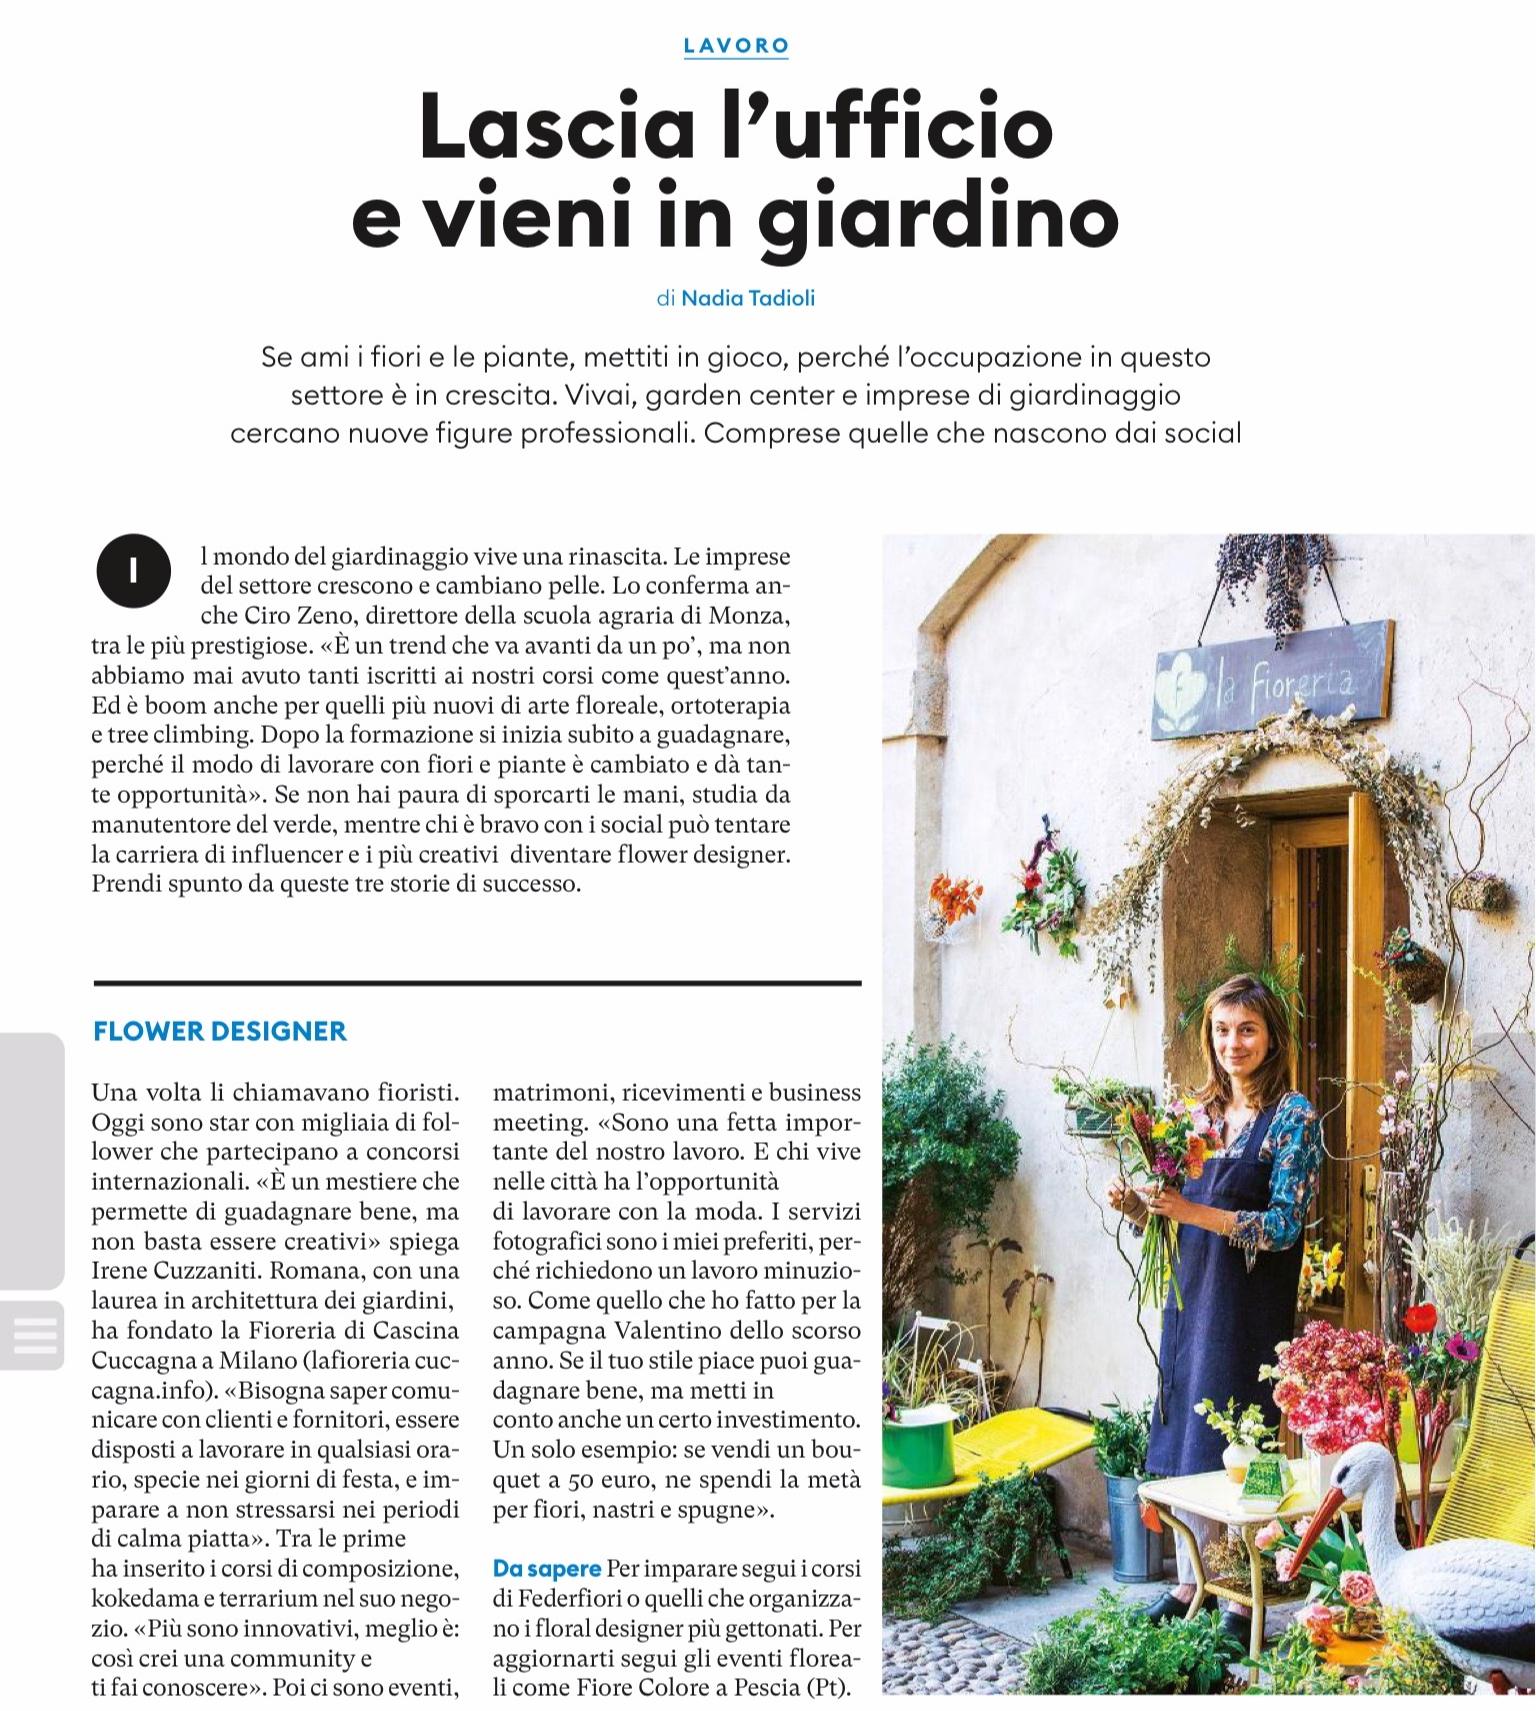 DONNA MODERNA - Intervista di Nadia TadioliFoto Matteo Carassale13 Febbraio 2019